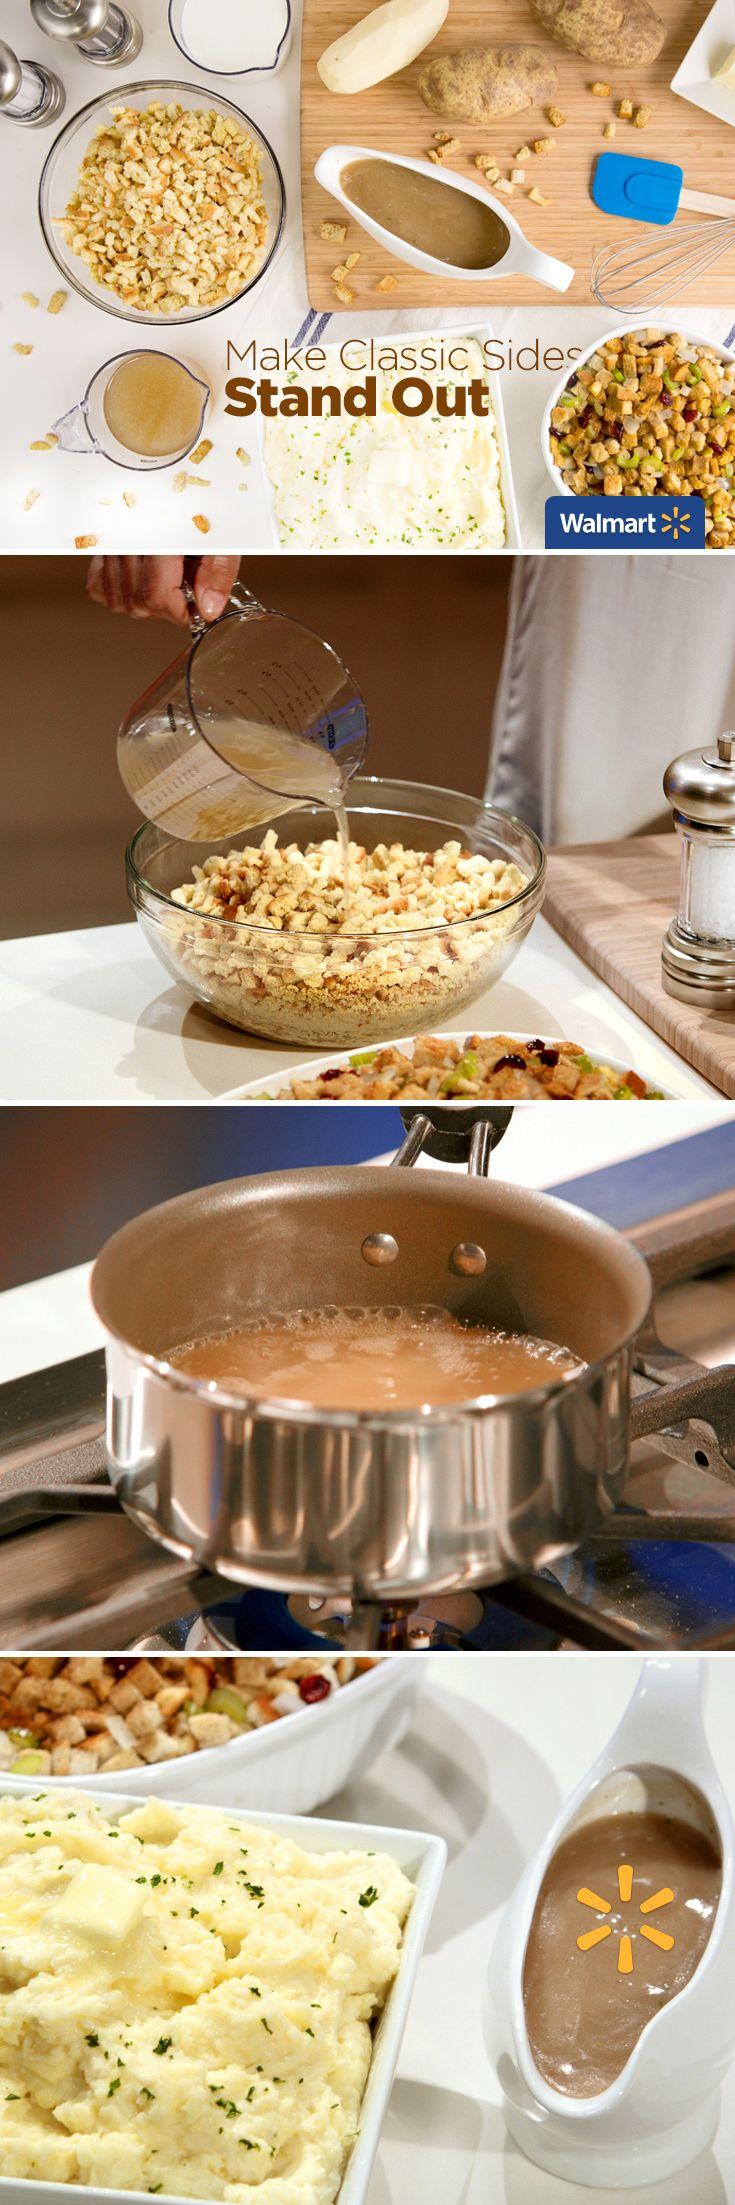 how to make whipped potato gravy